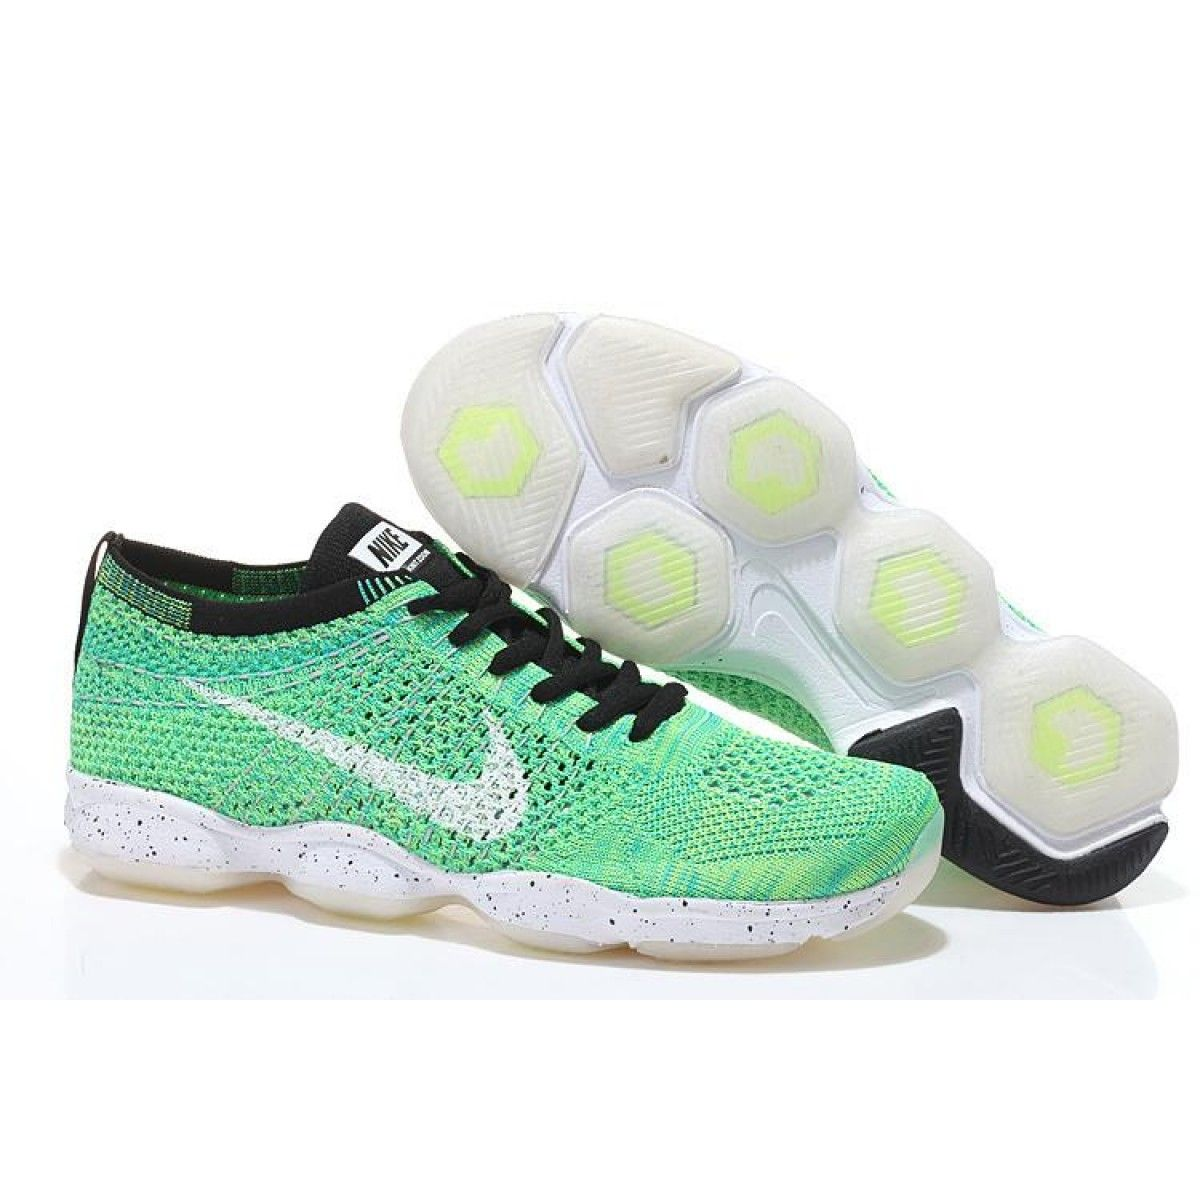 new product d5331 458cf Nike Flyknit Zoom Agility Women s Training Shoe - Green White